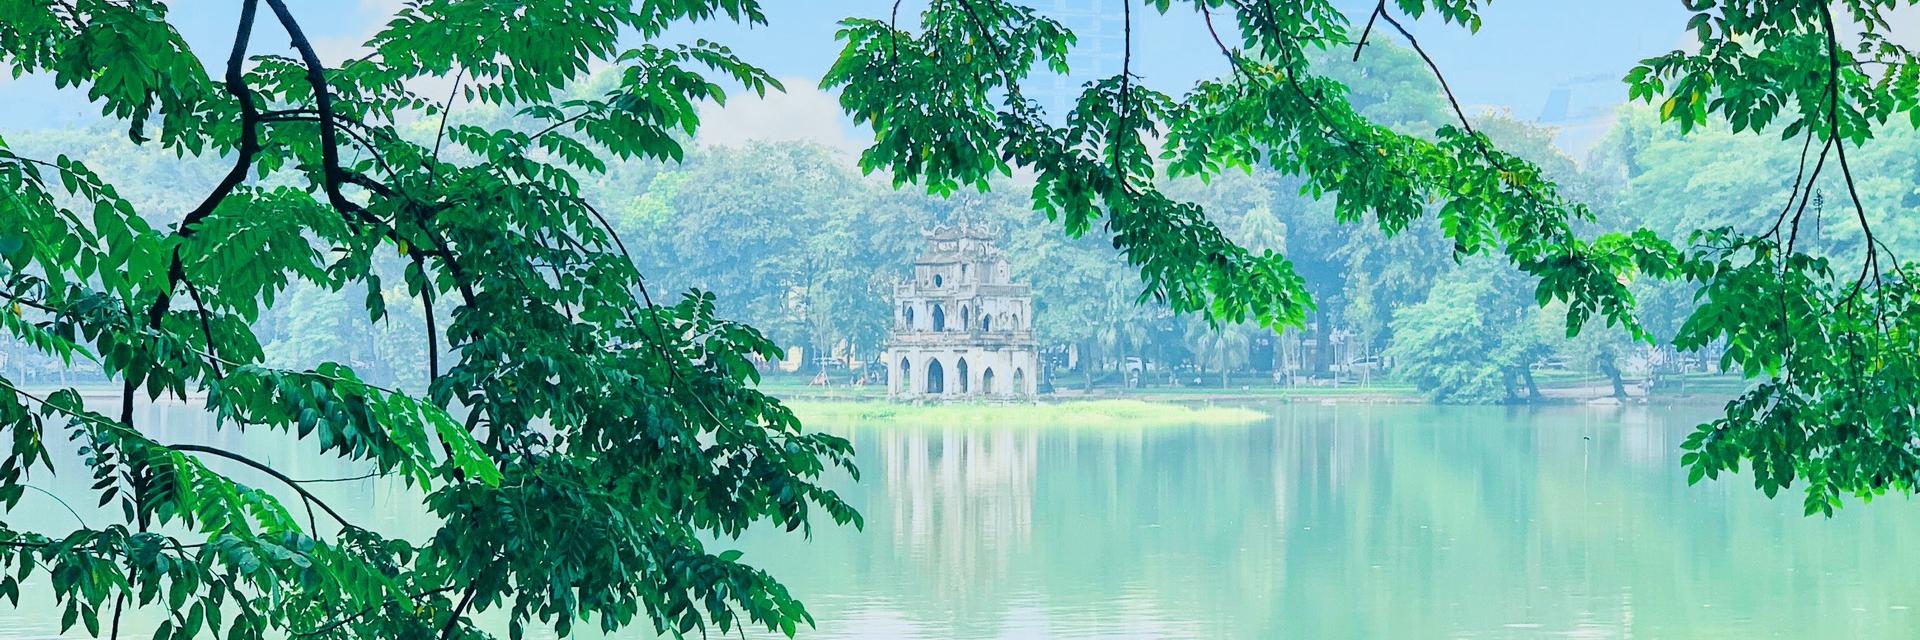 https://gody.vn/blog/hoangphuong13133810/post/ha-noi-nam-dinh-ninh-binh-phan-1-7344